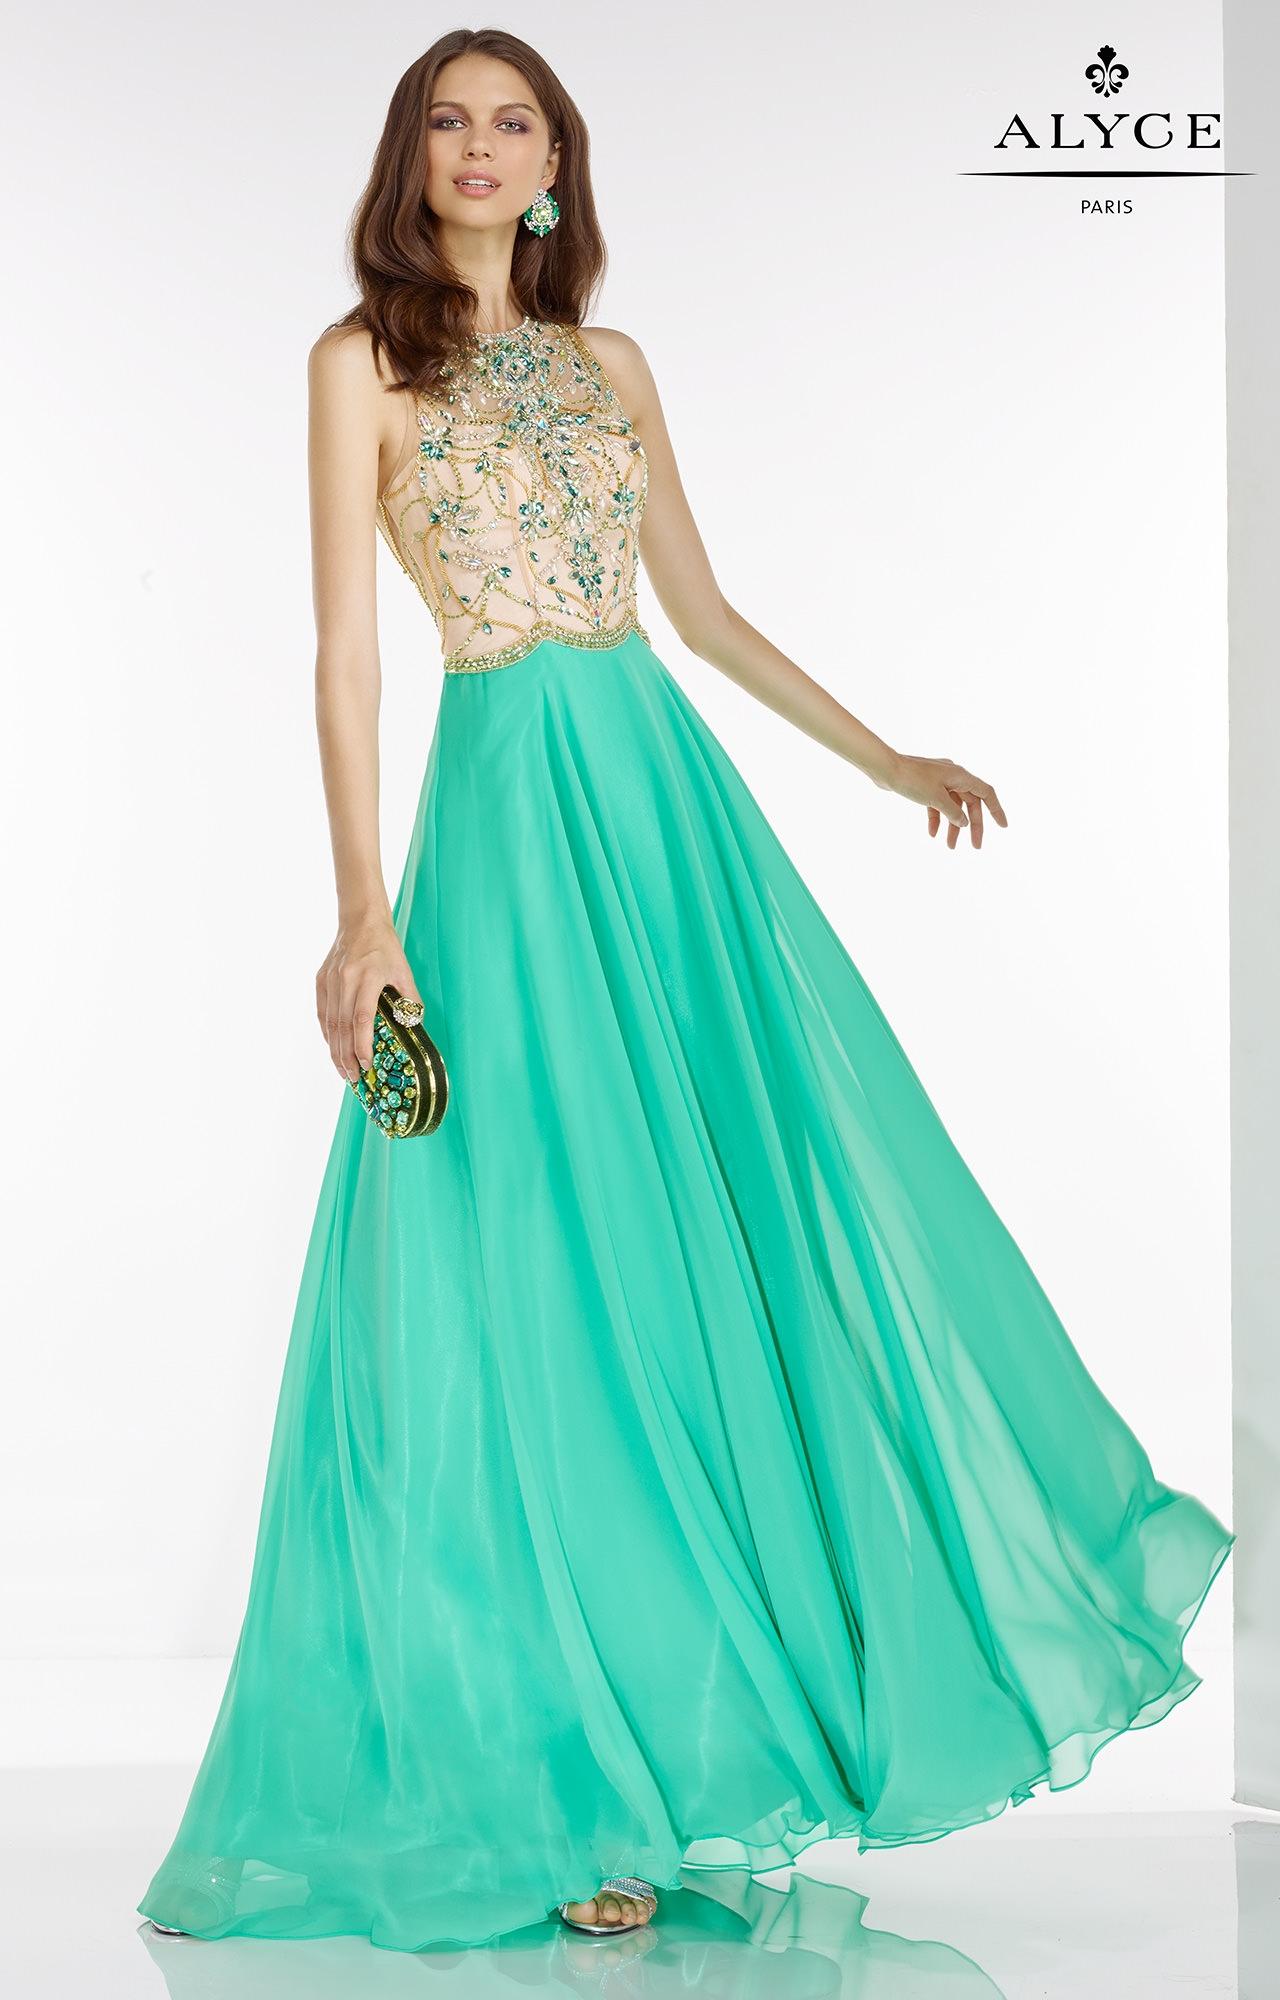 Alyce Paris 6526 - Sweetly Yours Dress Prom Dress